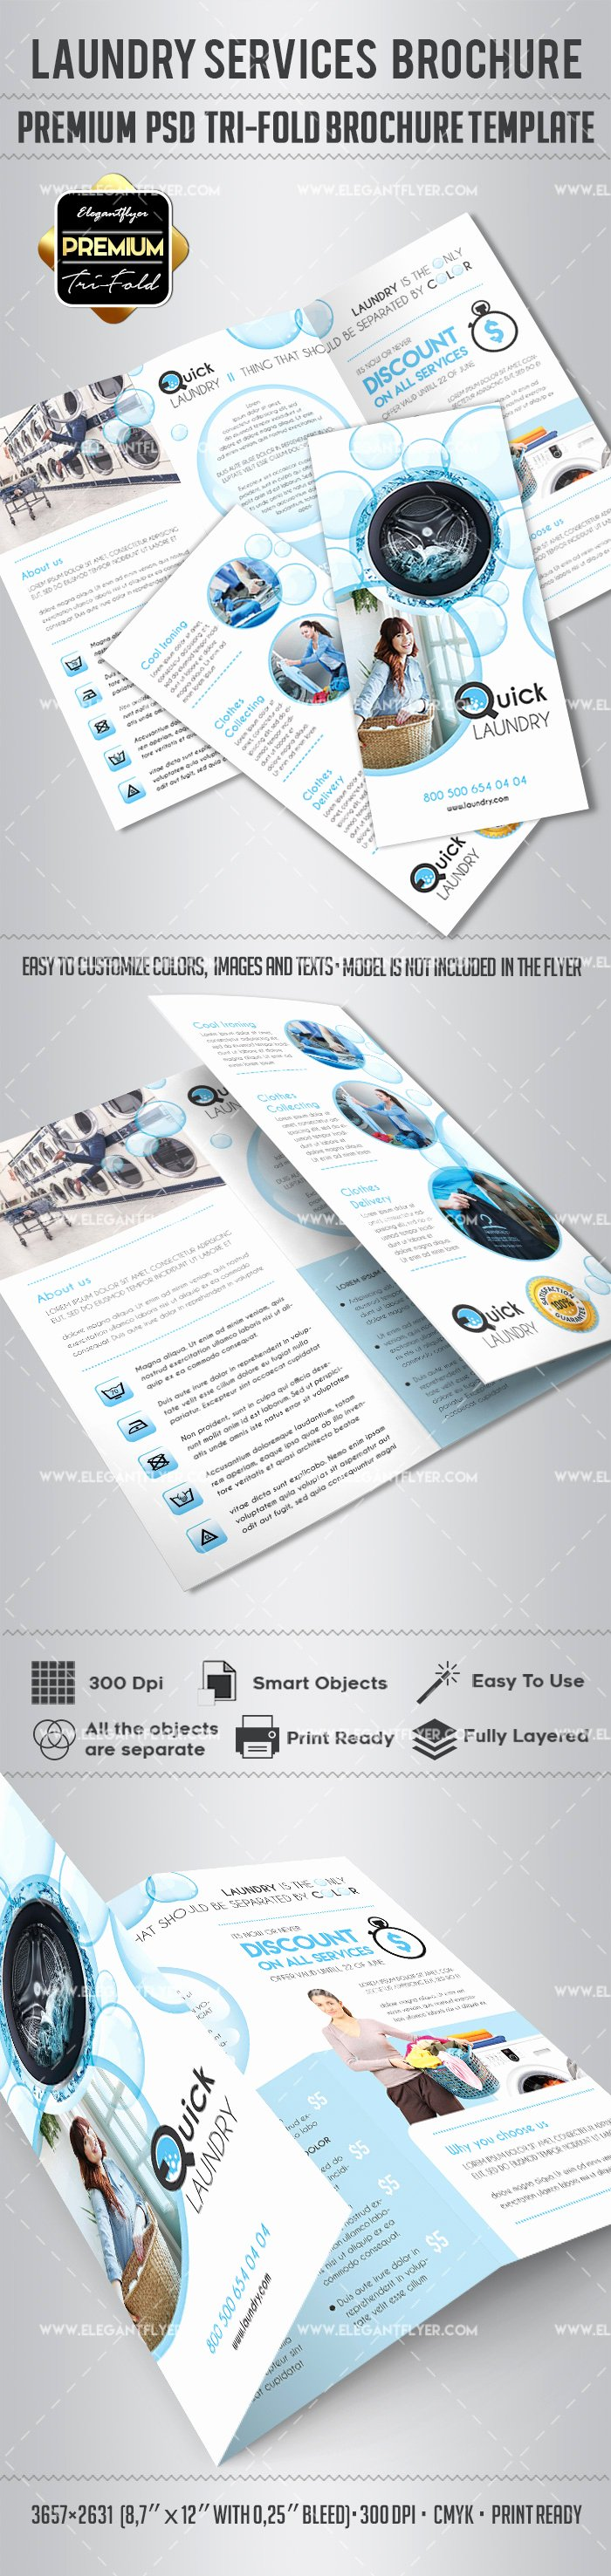 Tri Fold Brochure Template Psd Best Of Tri Fold Psd Brochure for Laundry Services – by Elegantflyer